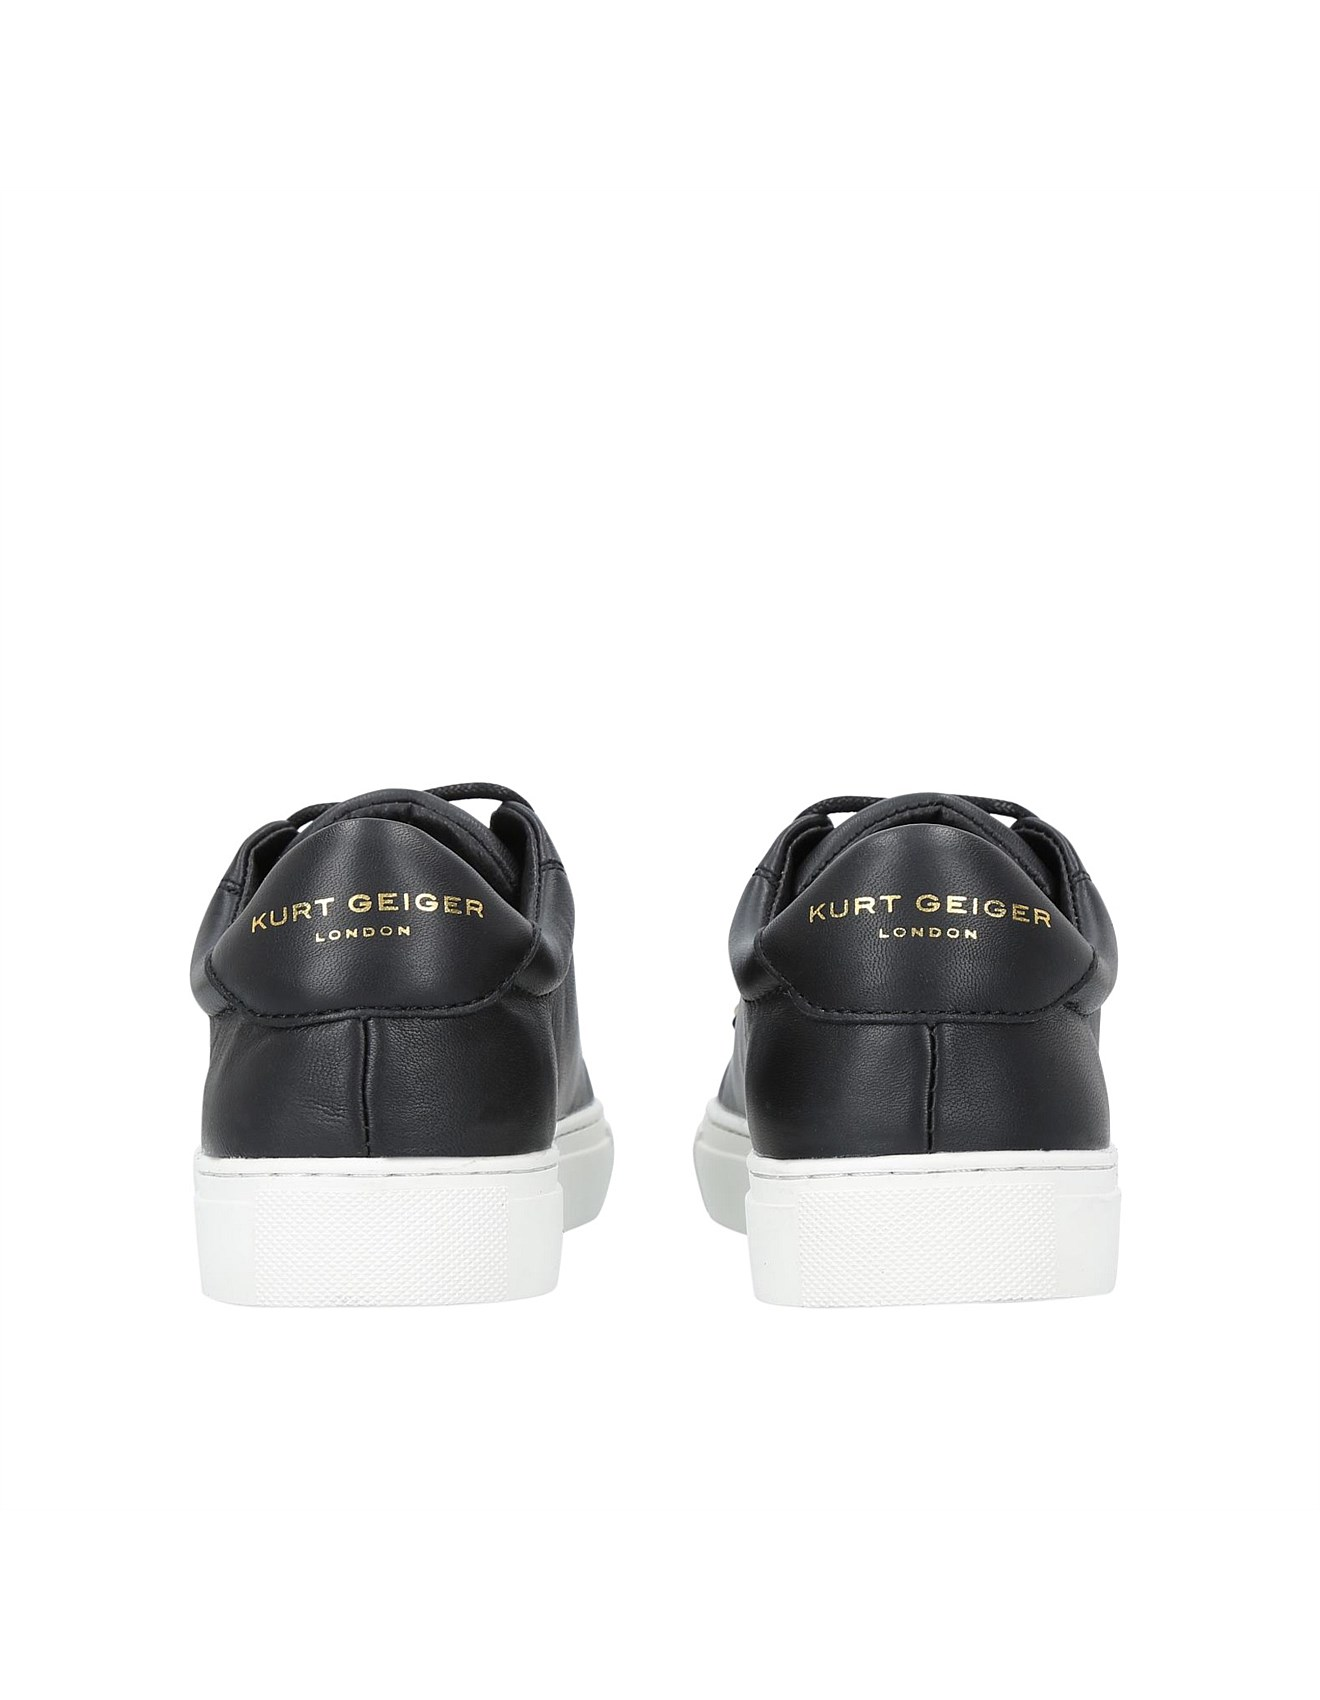 Shoes - KURT GEIGER LONDON-LARNIE-BLACK